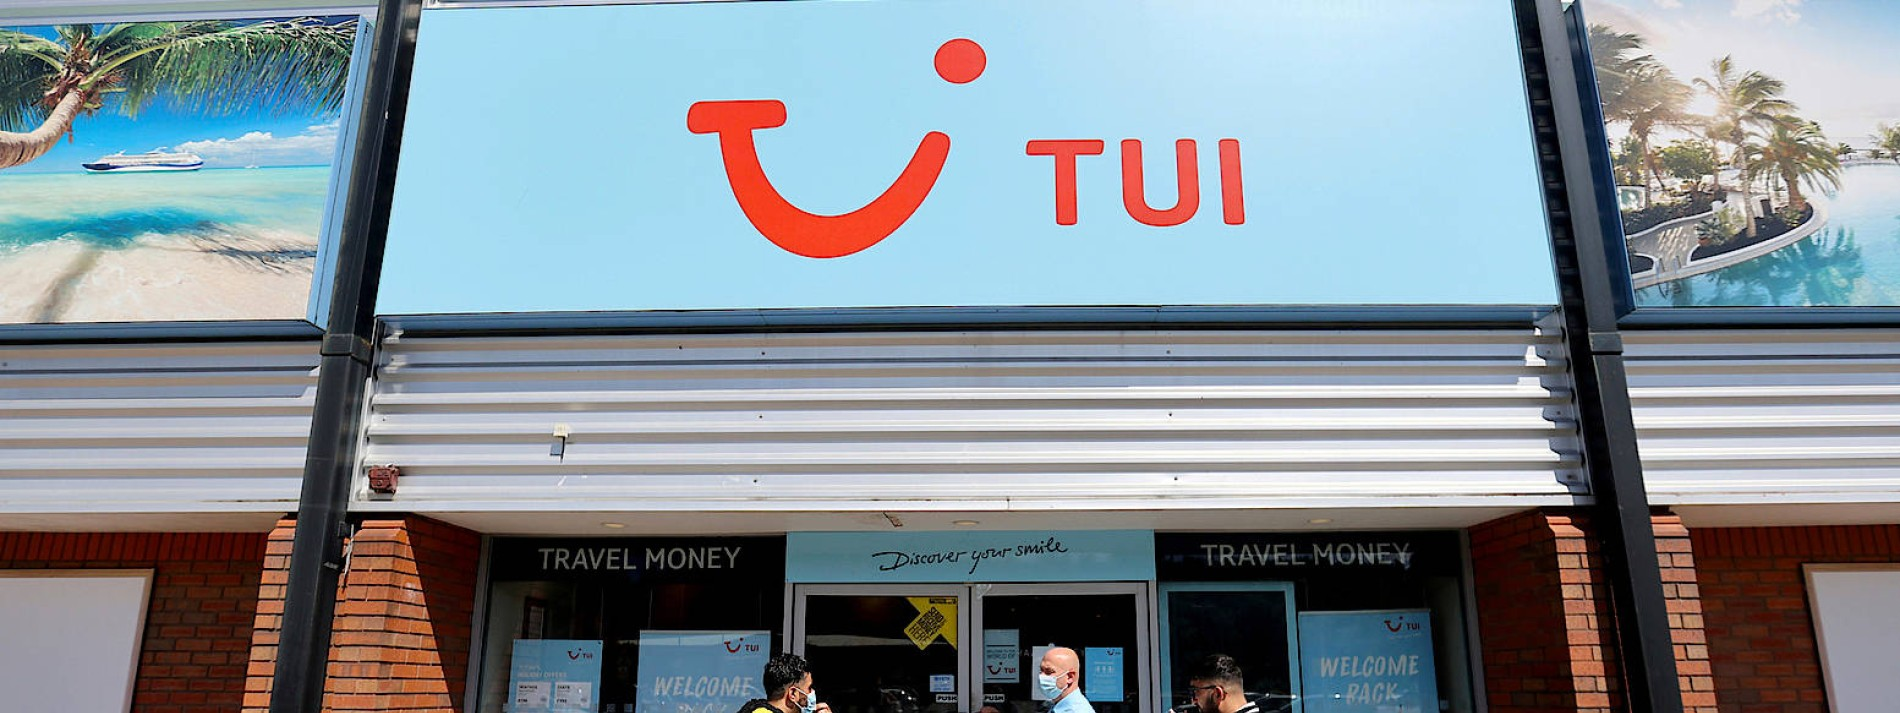 Brüssel genehmigt Milliarden-Staatshilfe für TUI